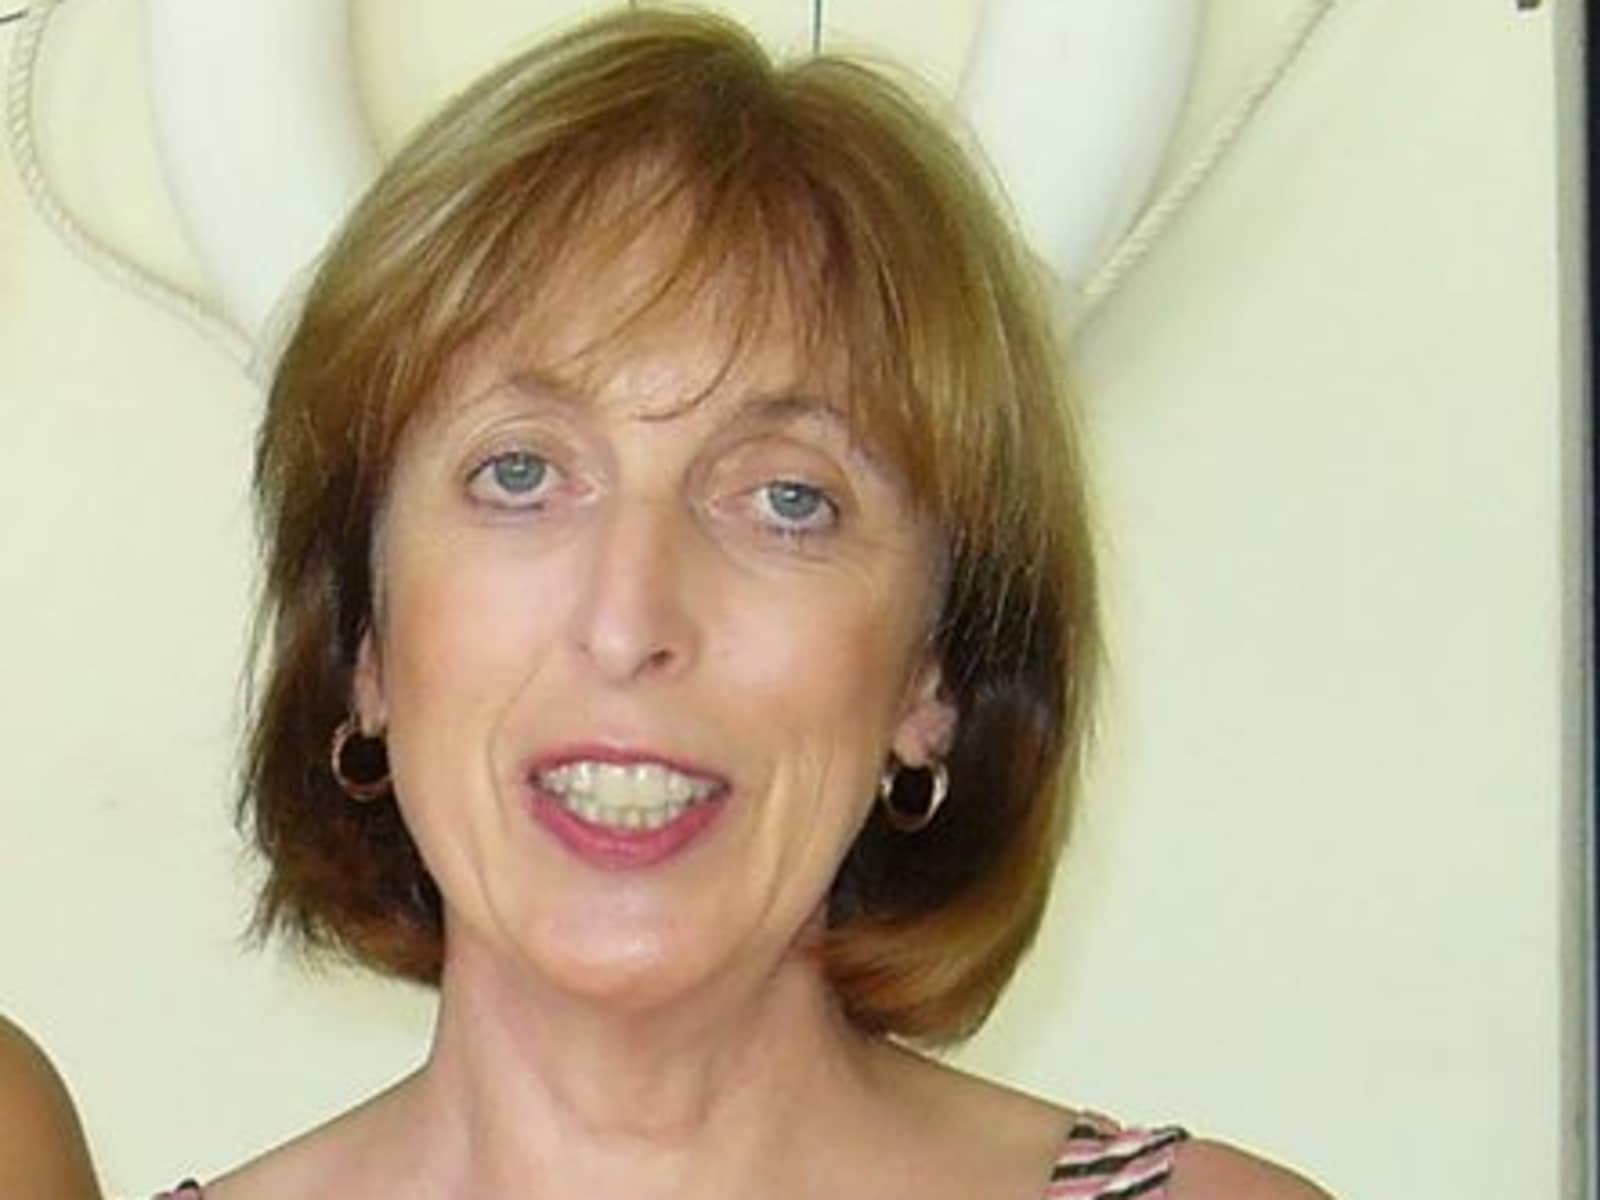 Jane from Knutsford, United Kingdom